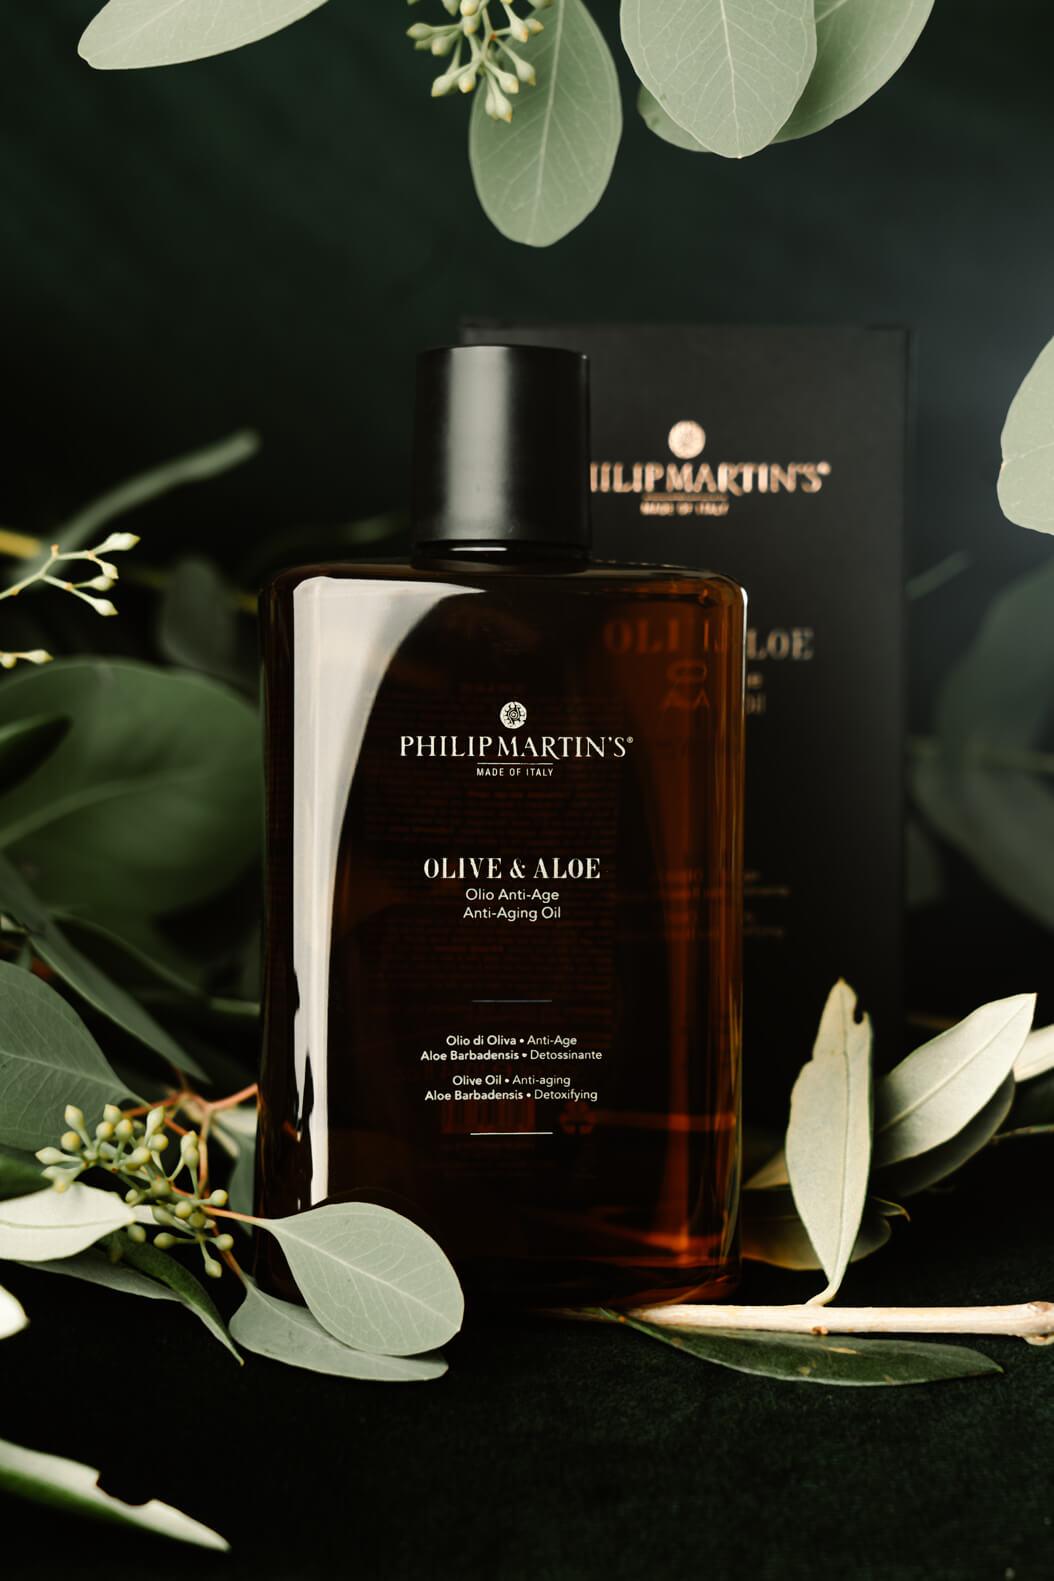 Philip Martin's Olive and Aloe Oil |Konzept H